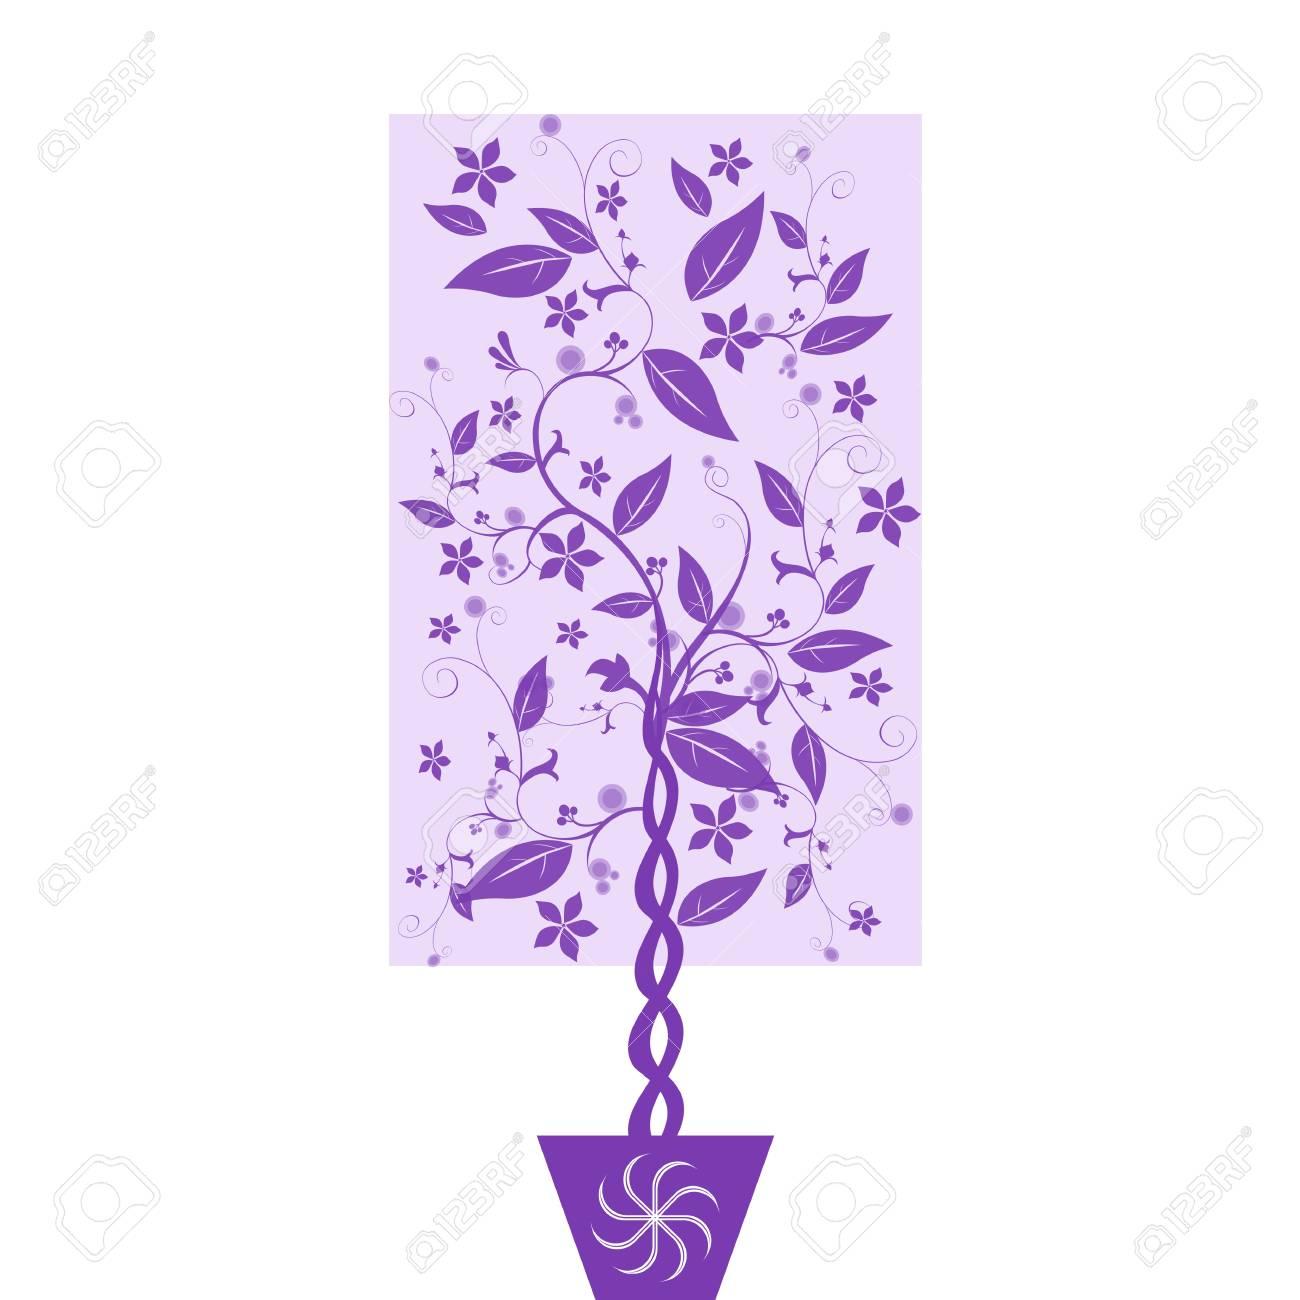 Beautiful art tree isolated on white backgroud Stock Vector - 10337318